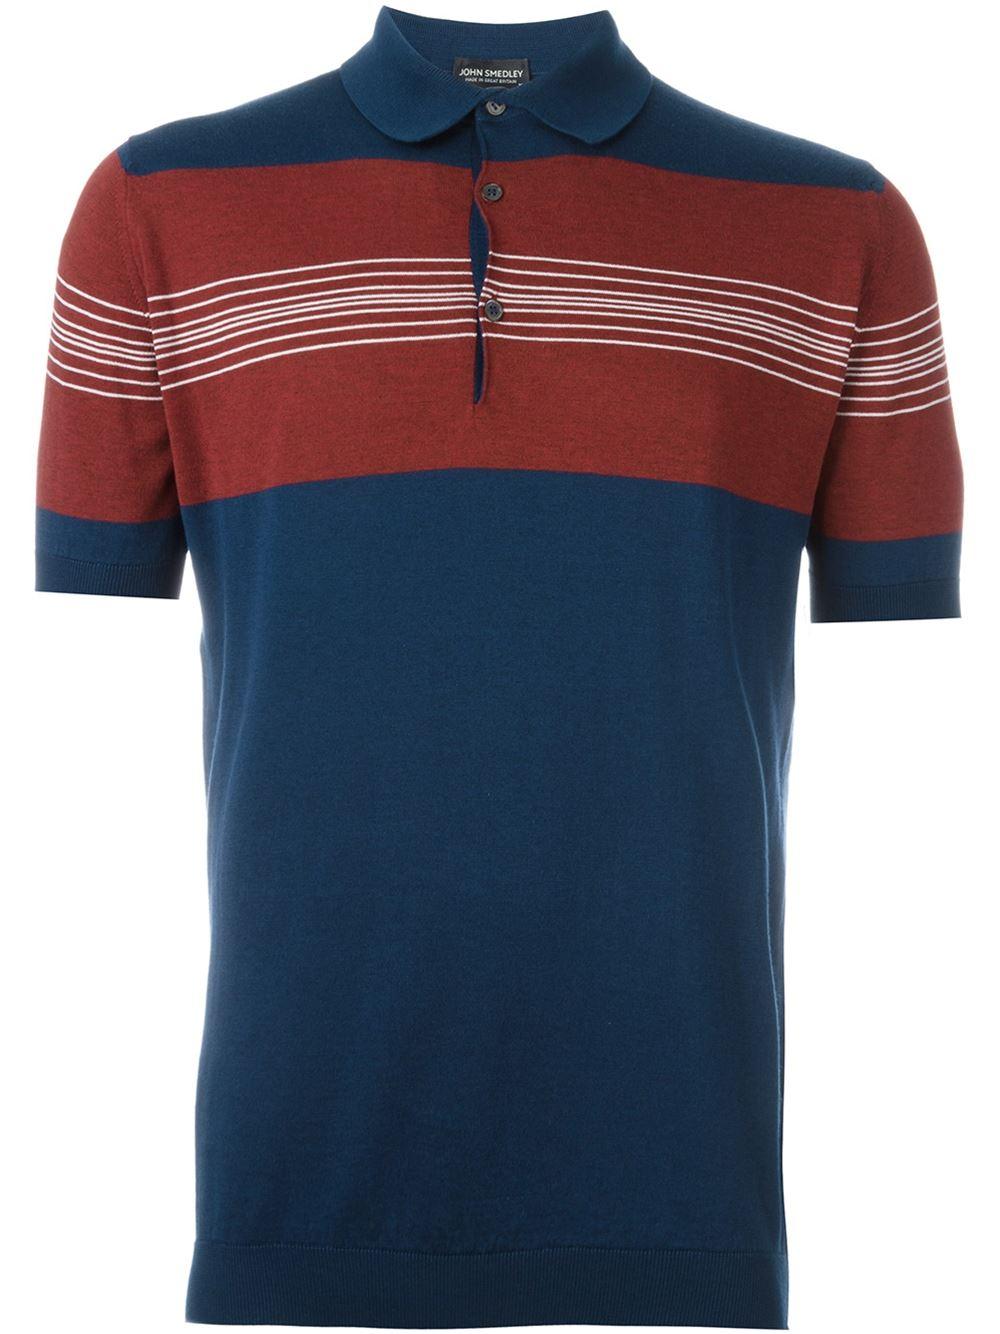 John Smedley Knitted Polo Shirt